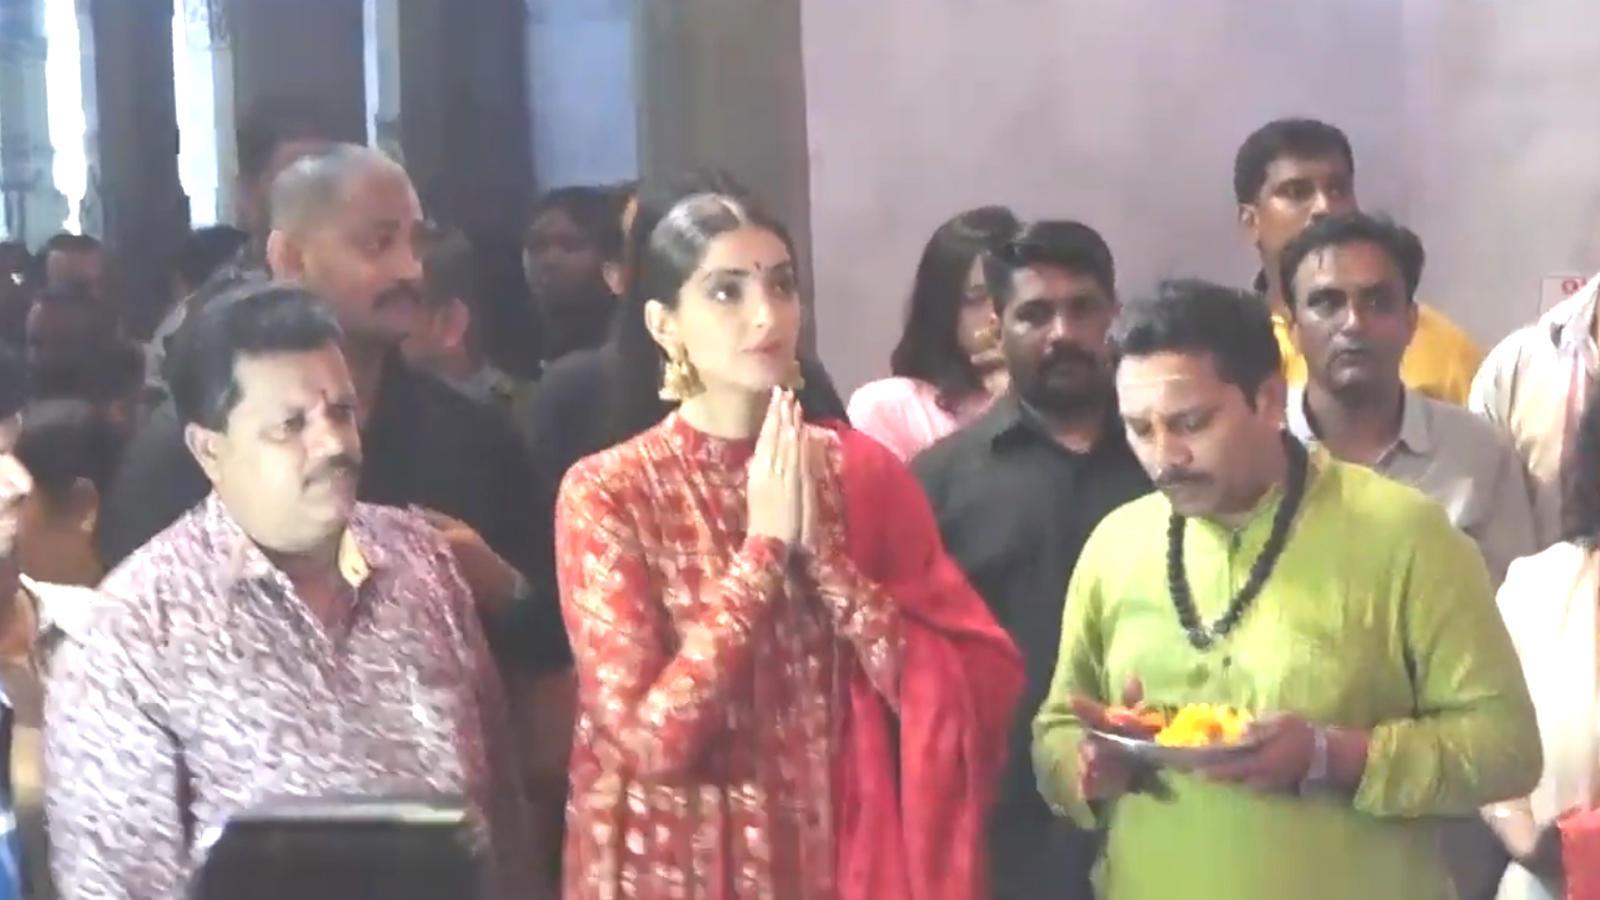 Sonam Kapoor salutes Neerja Bhanot's courage and bravery